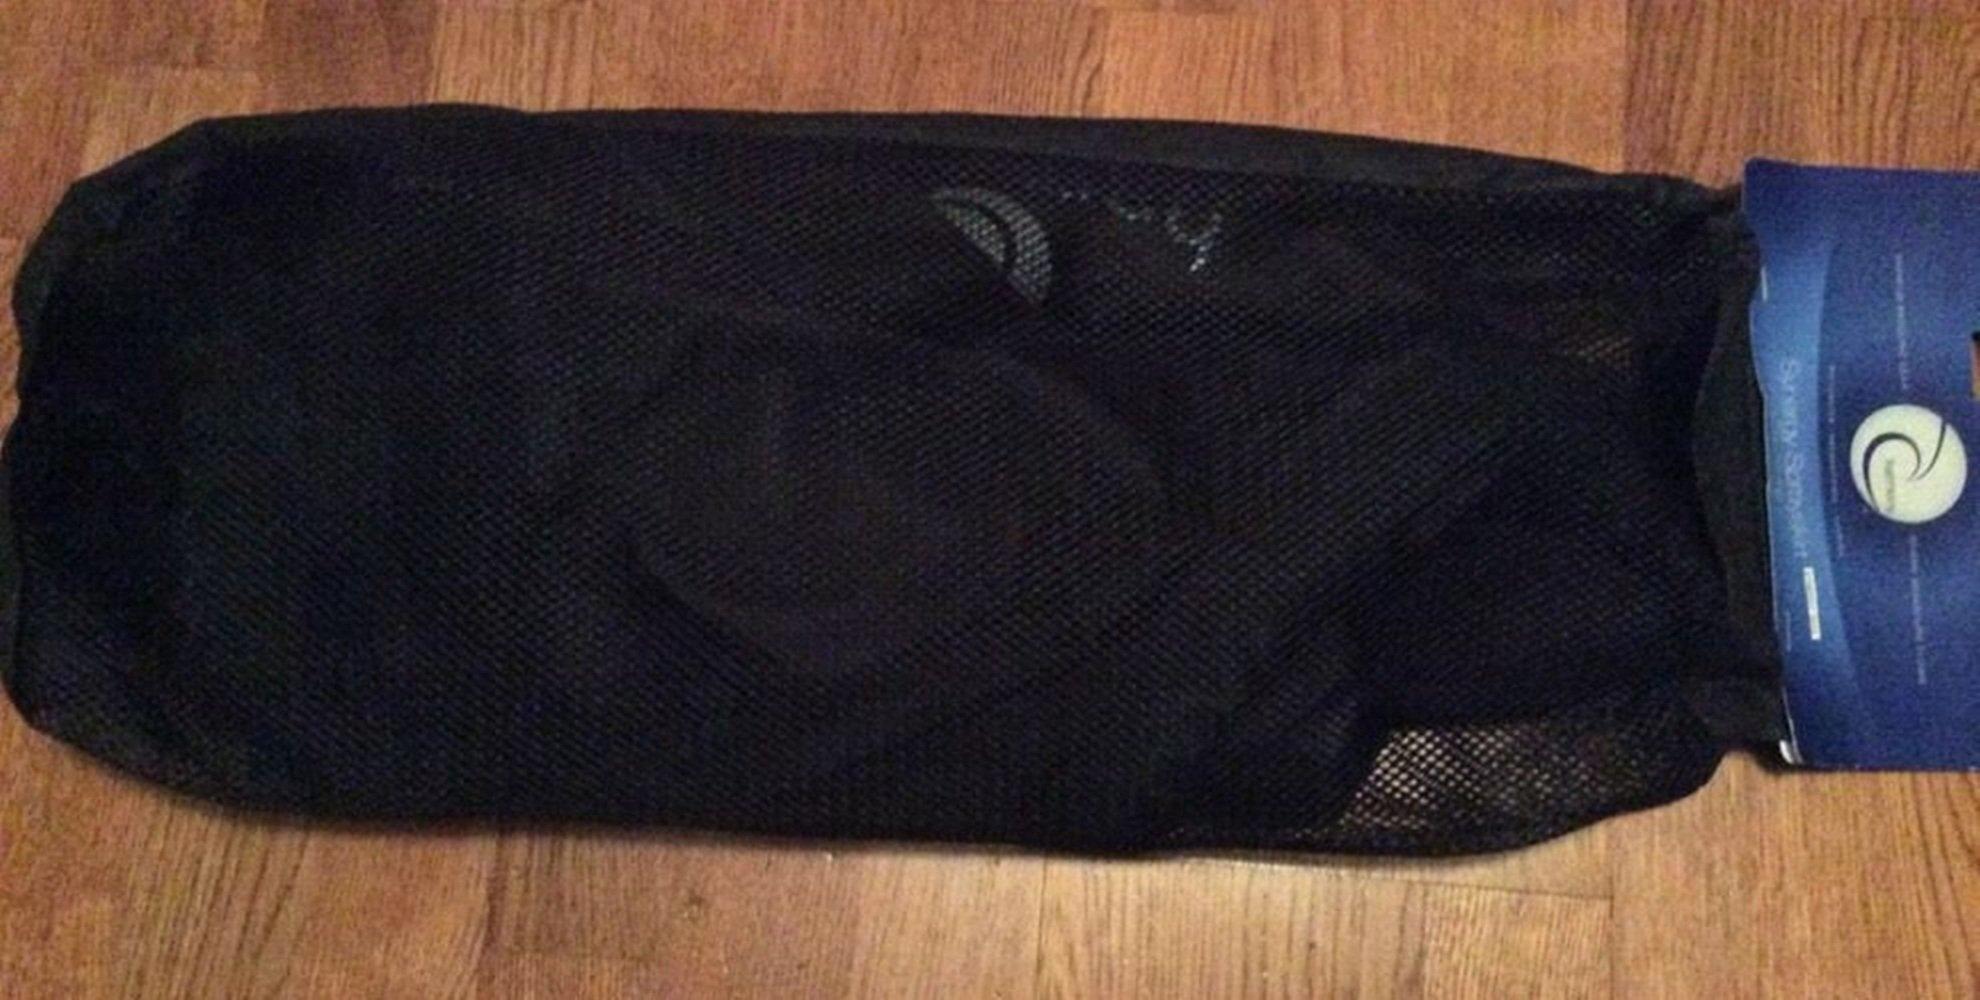 Harmony Synergy Kayak Spray Skirt 36/19 #8023385 Adjustable Neoprene Waist